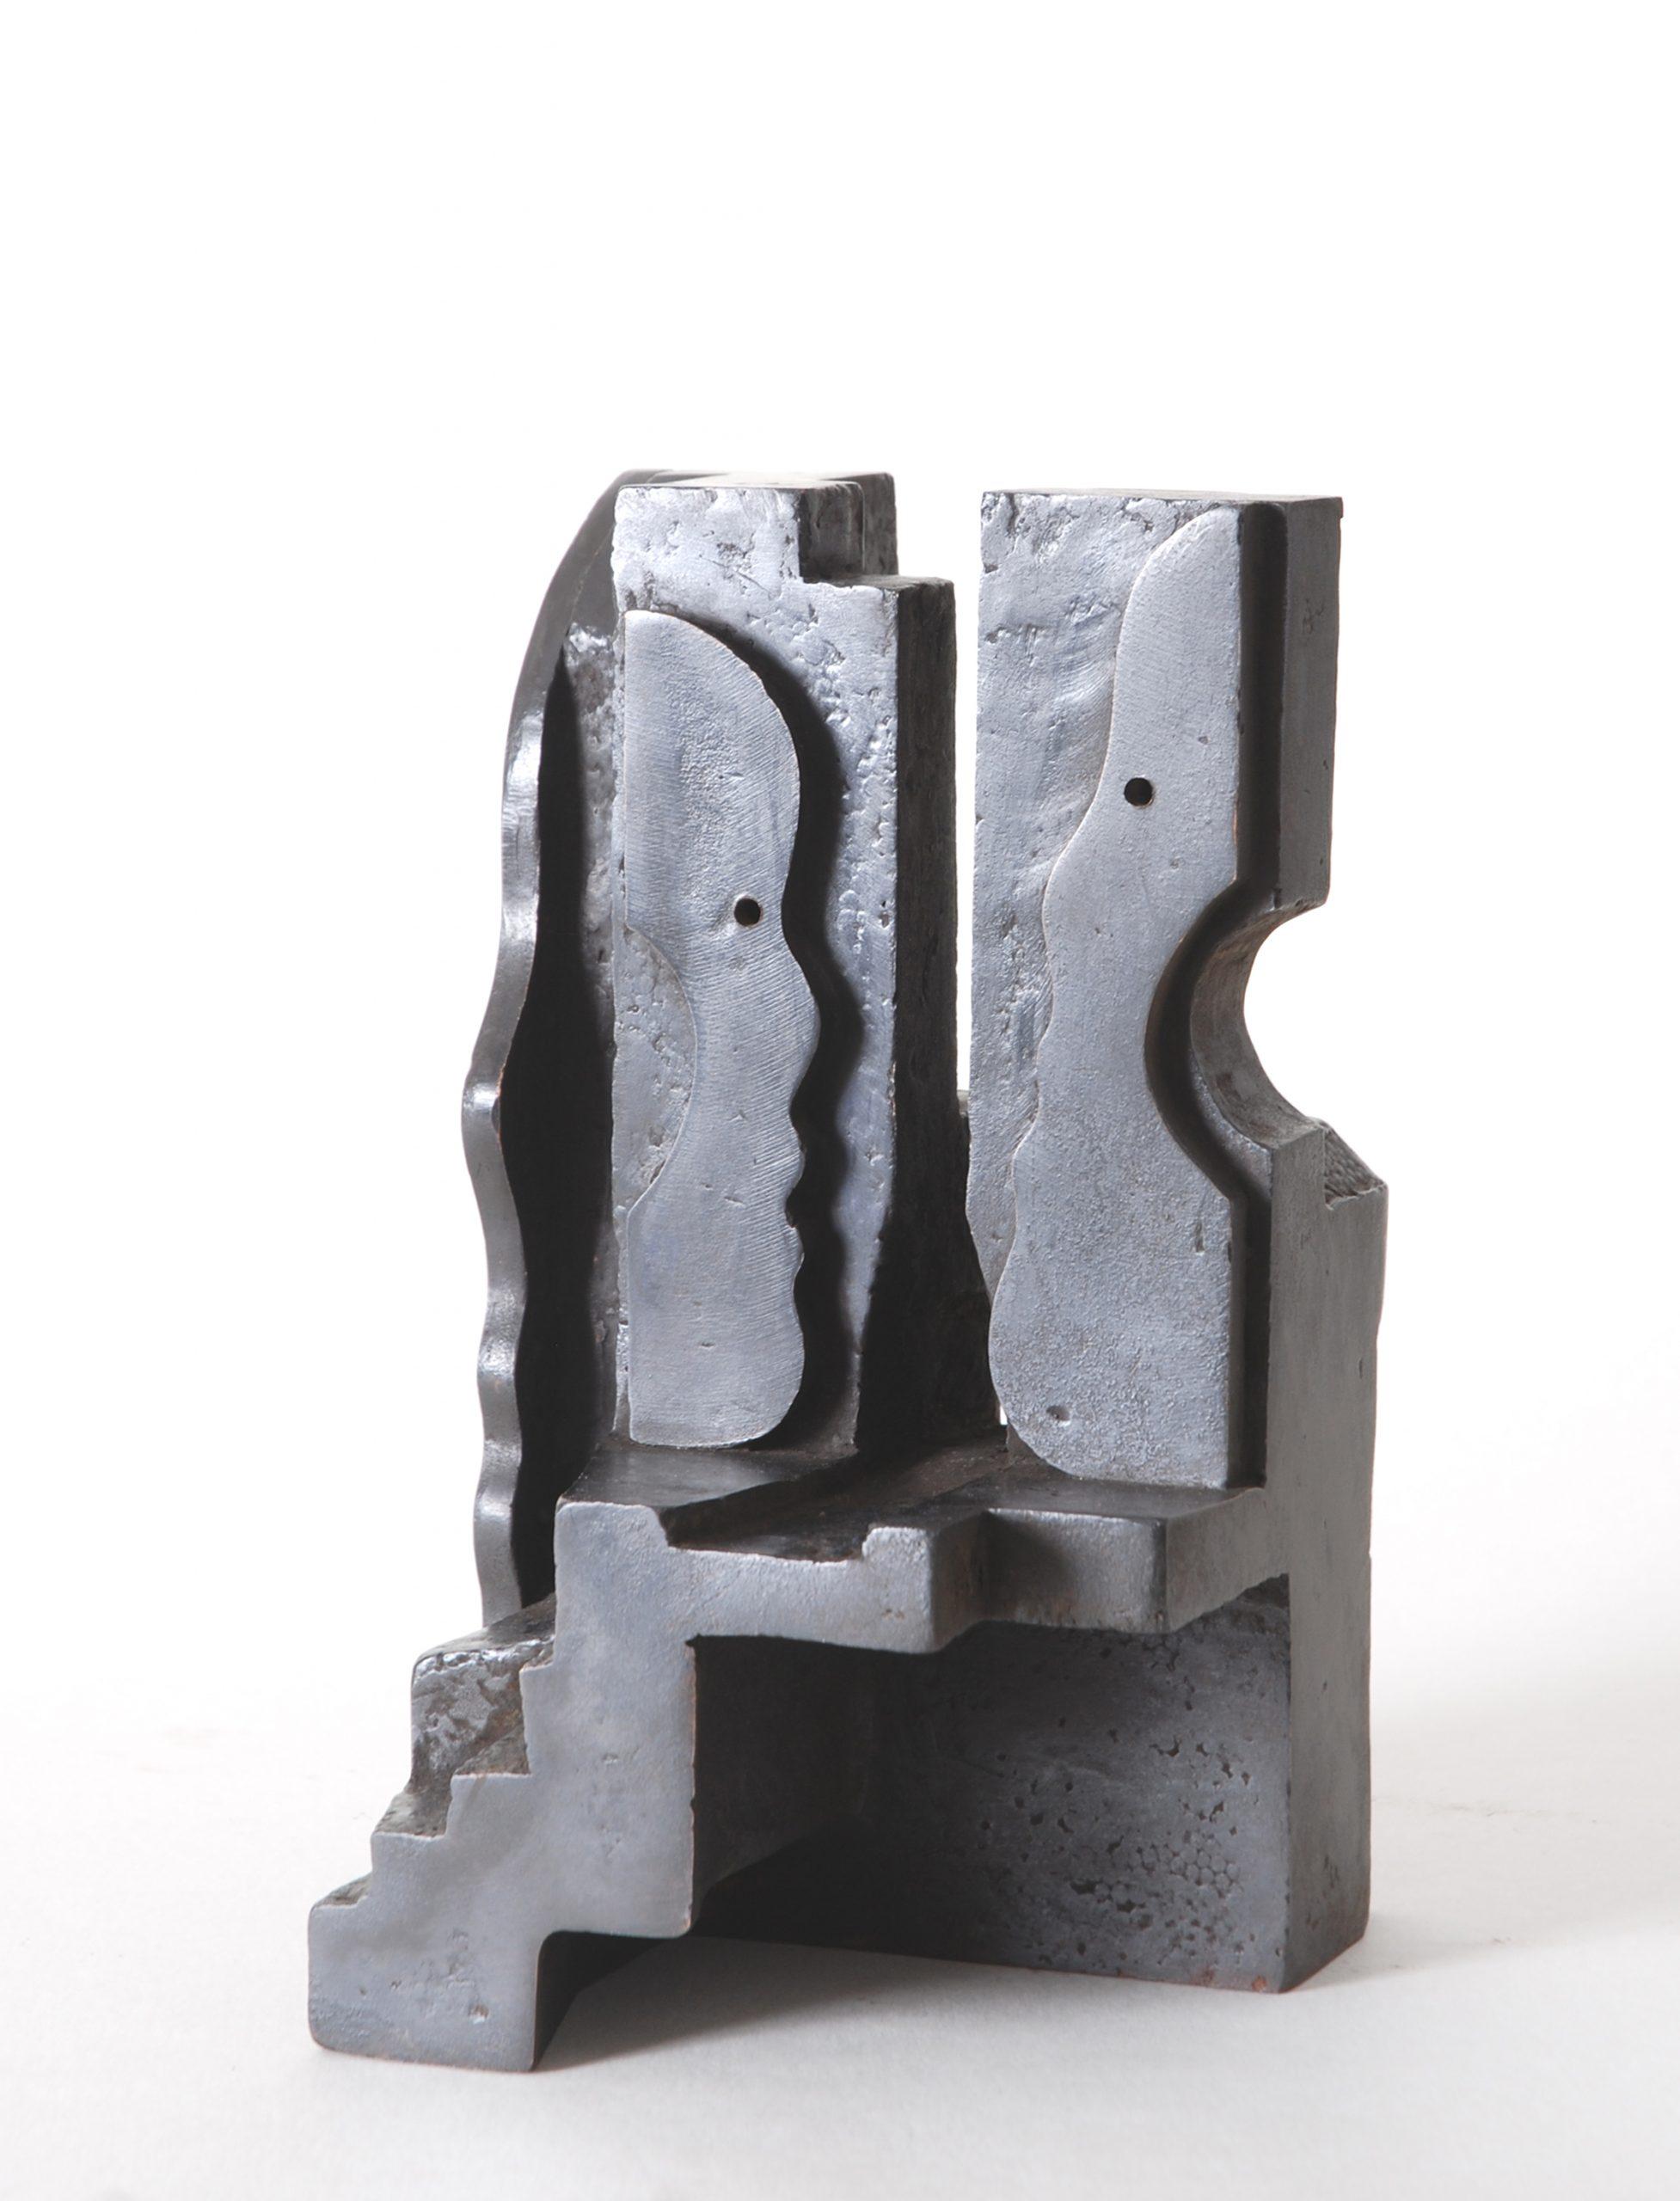 Bewoond huis - Rein Dool, 22 cm hoog. brons 2005